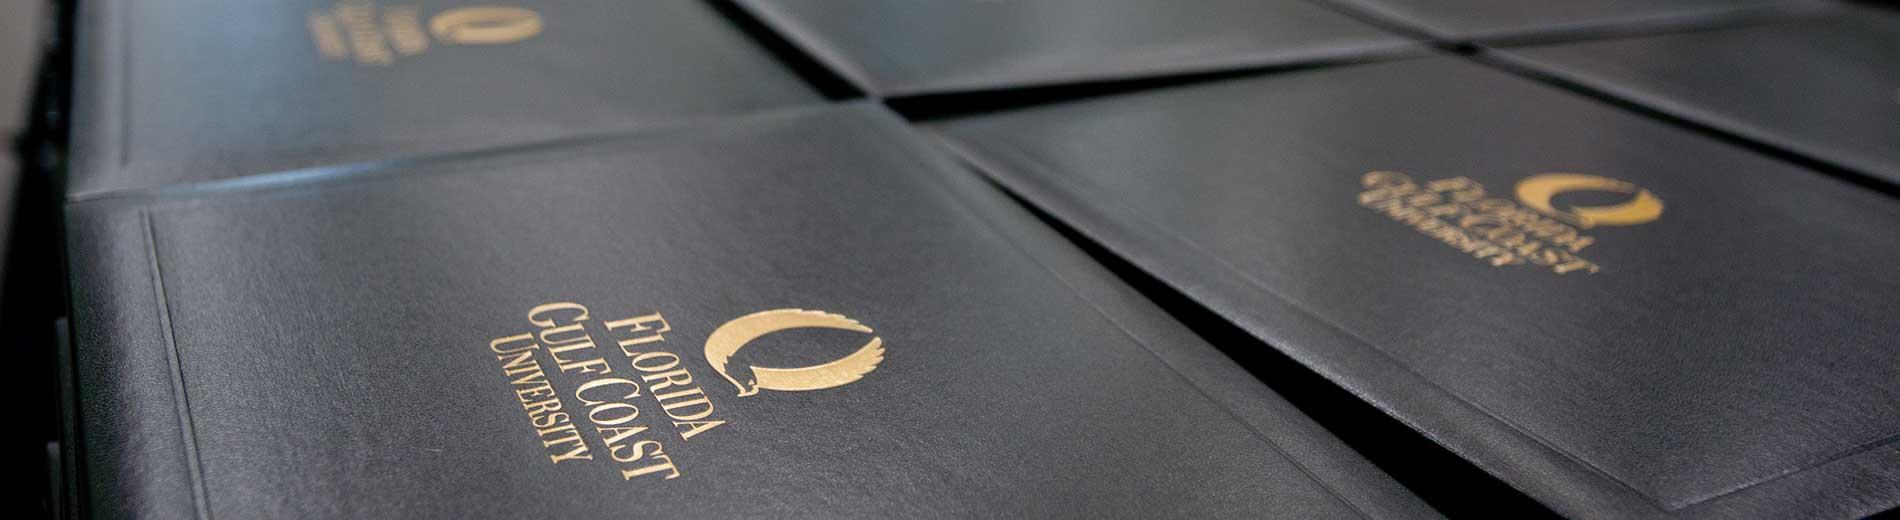 Photo shows FGCU diplomas